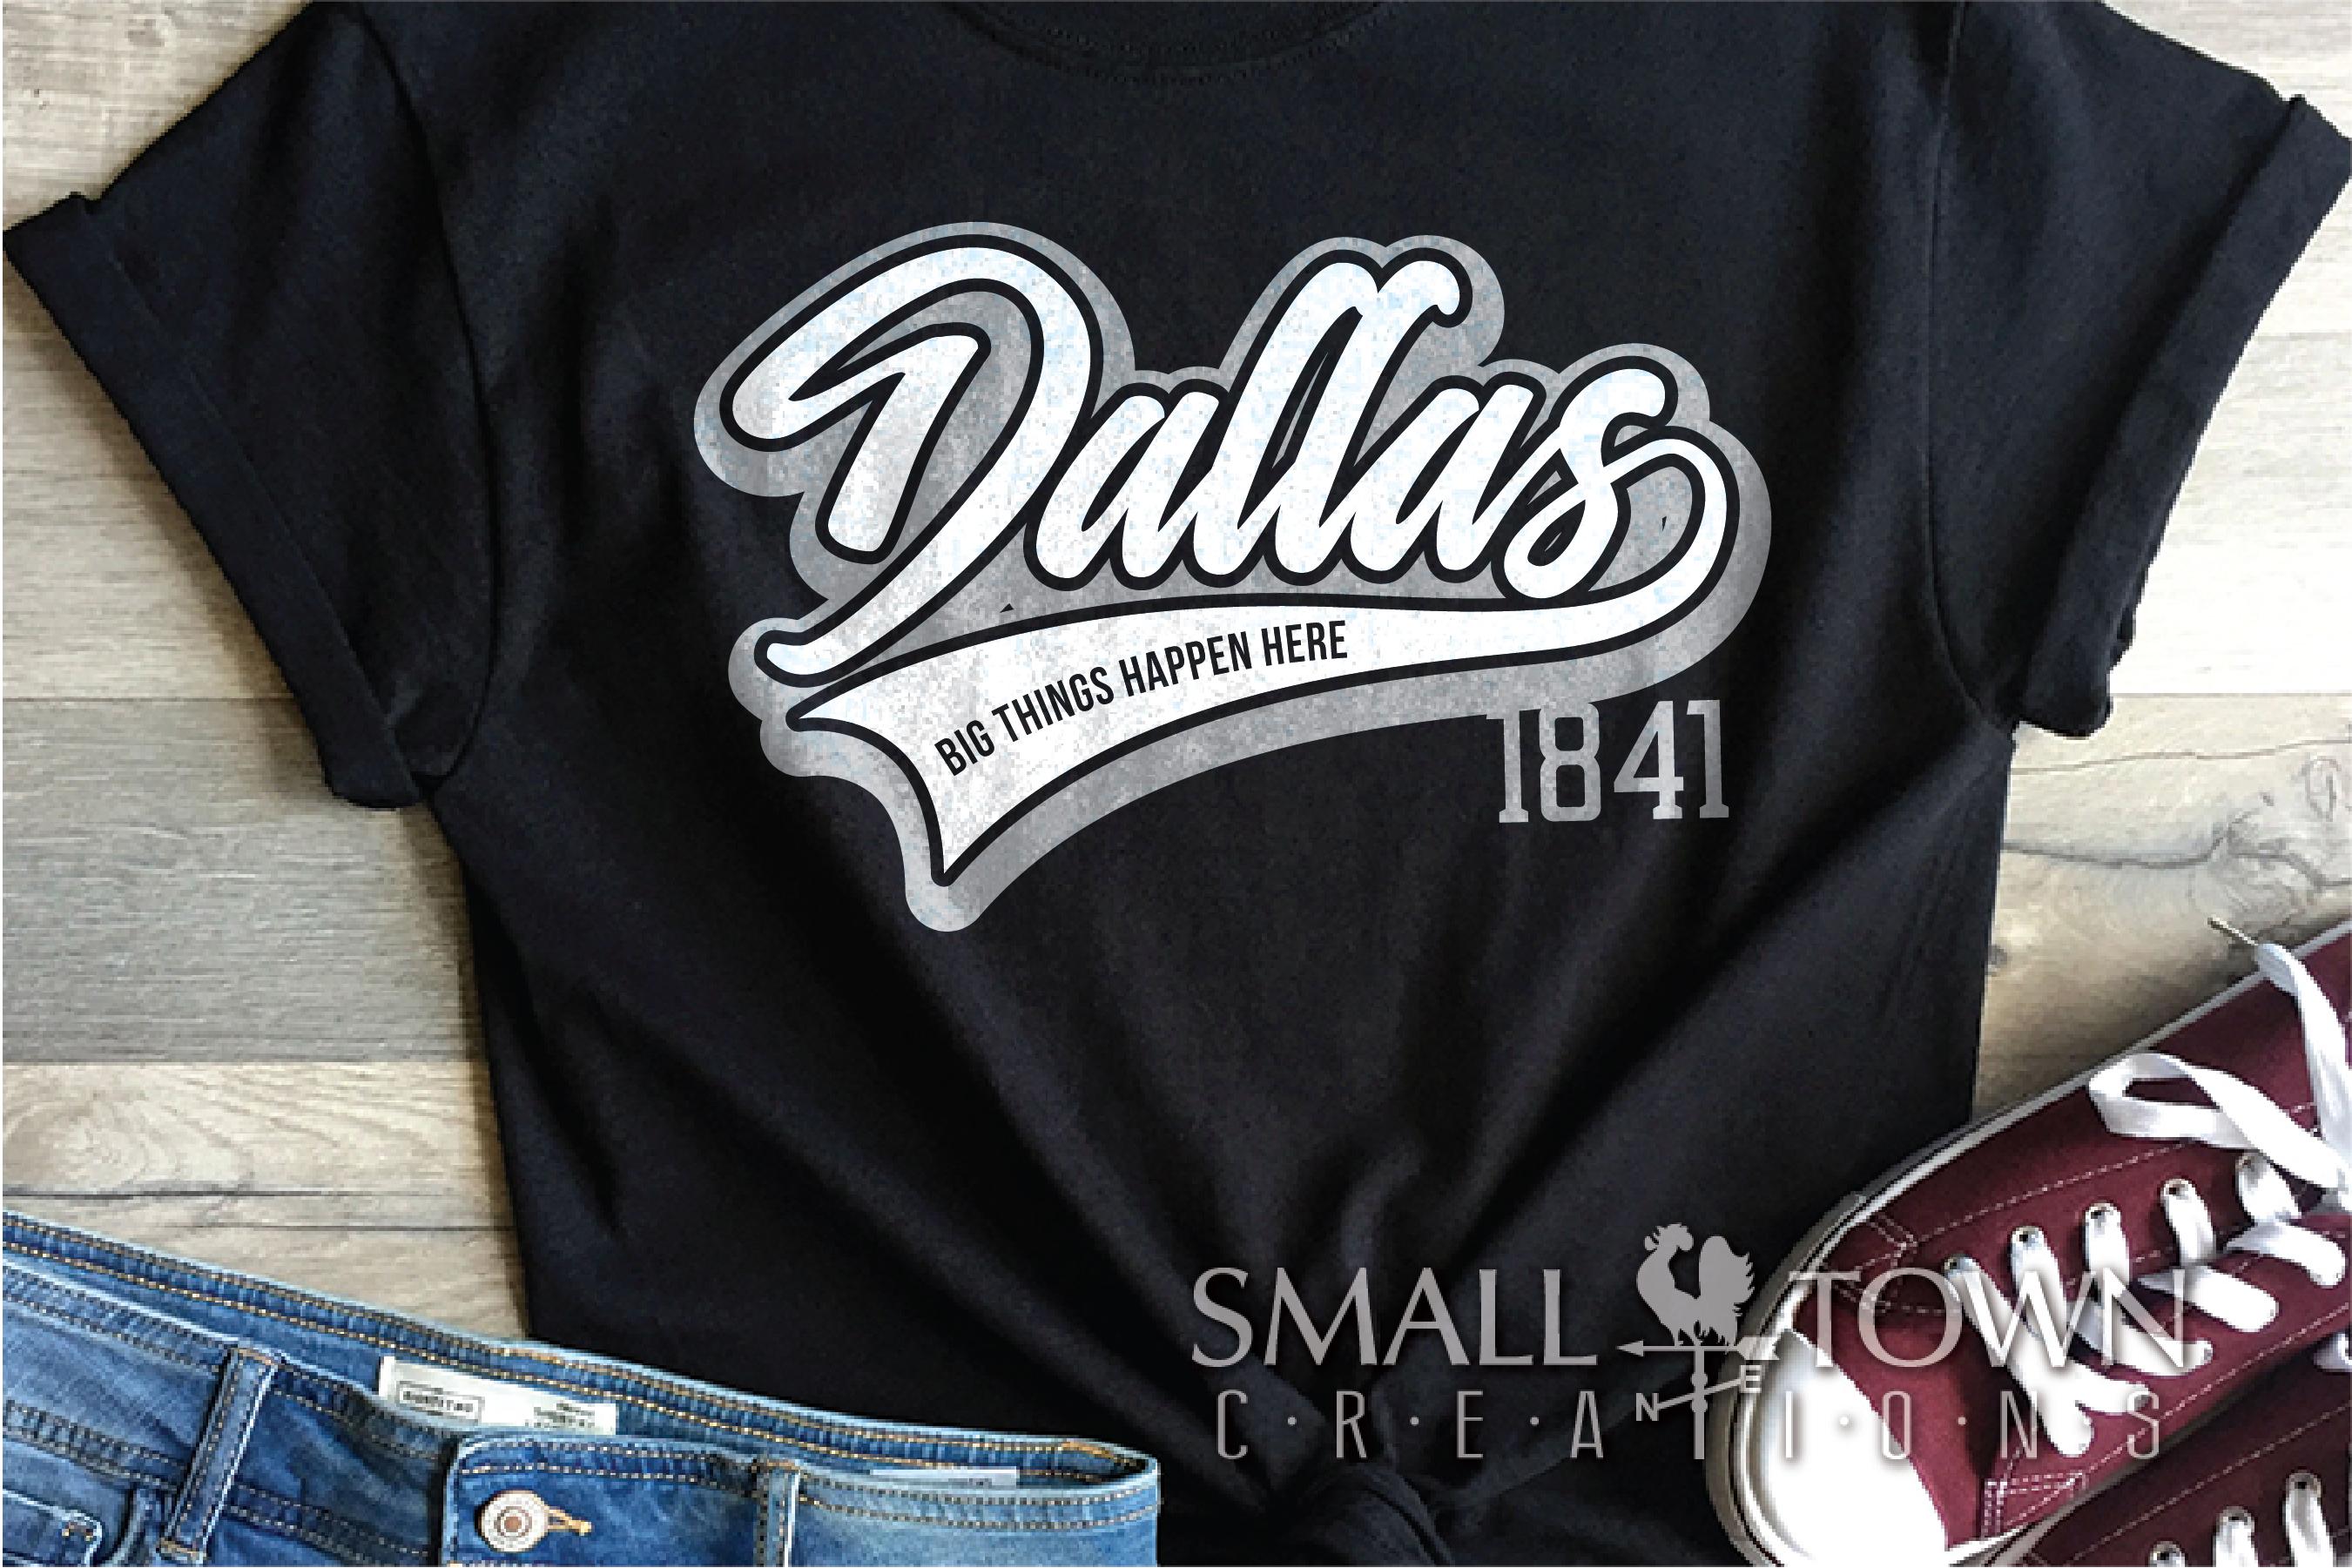 Dallas, Big Things Happen Here - slogan, PRINT, CUT & DESIGN example image 2